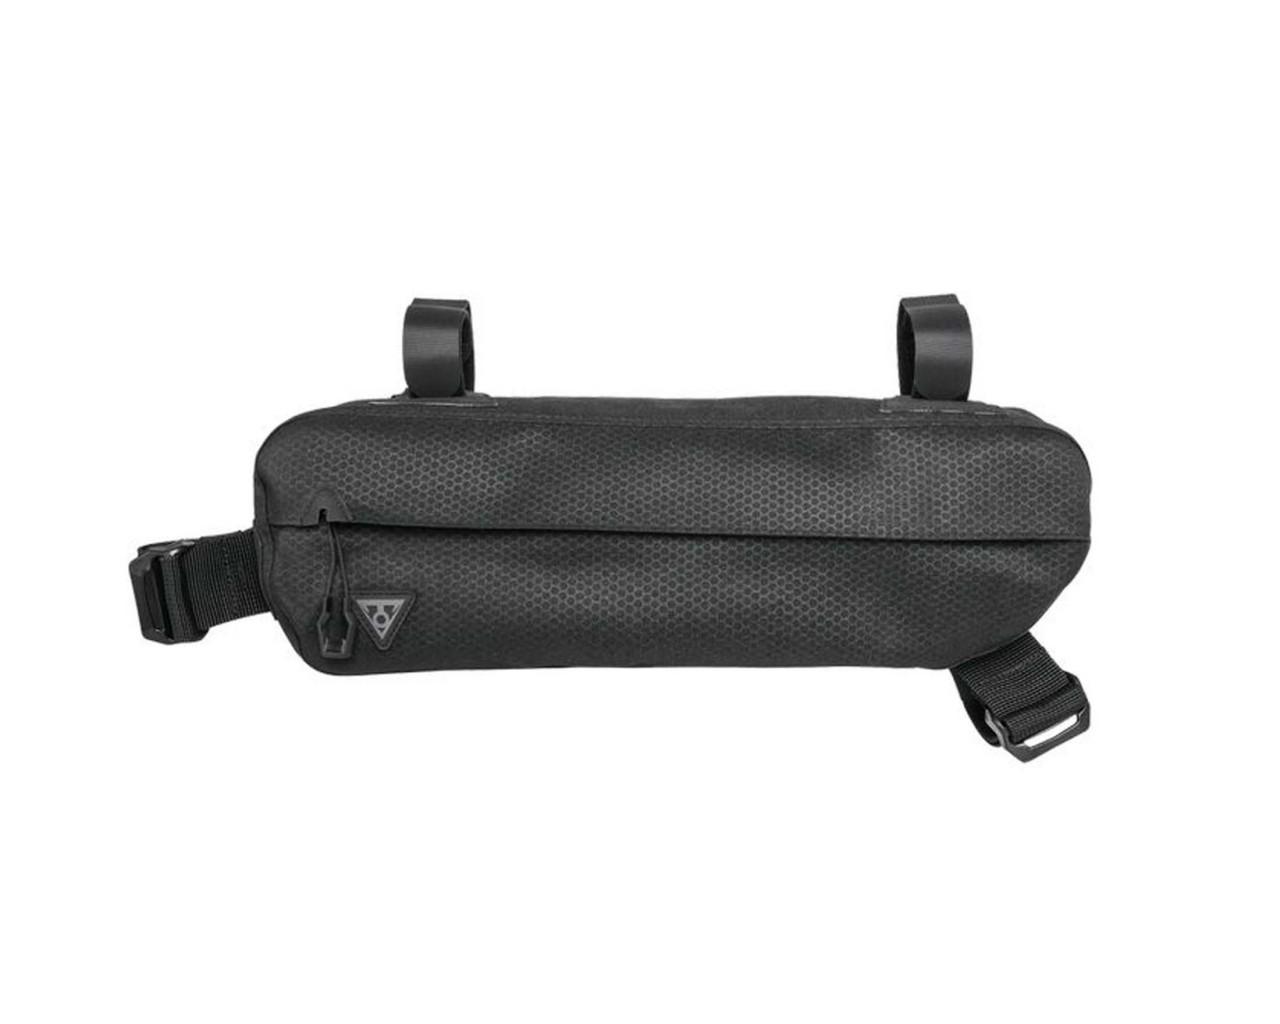 Topeak MidLoader Rahmentasche 3,0 Liter | black